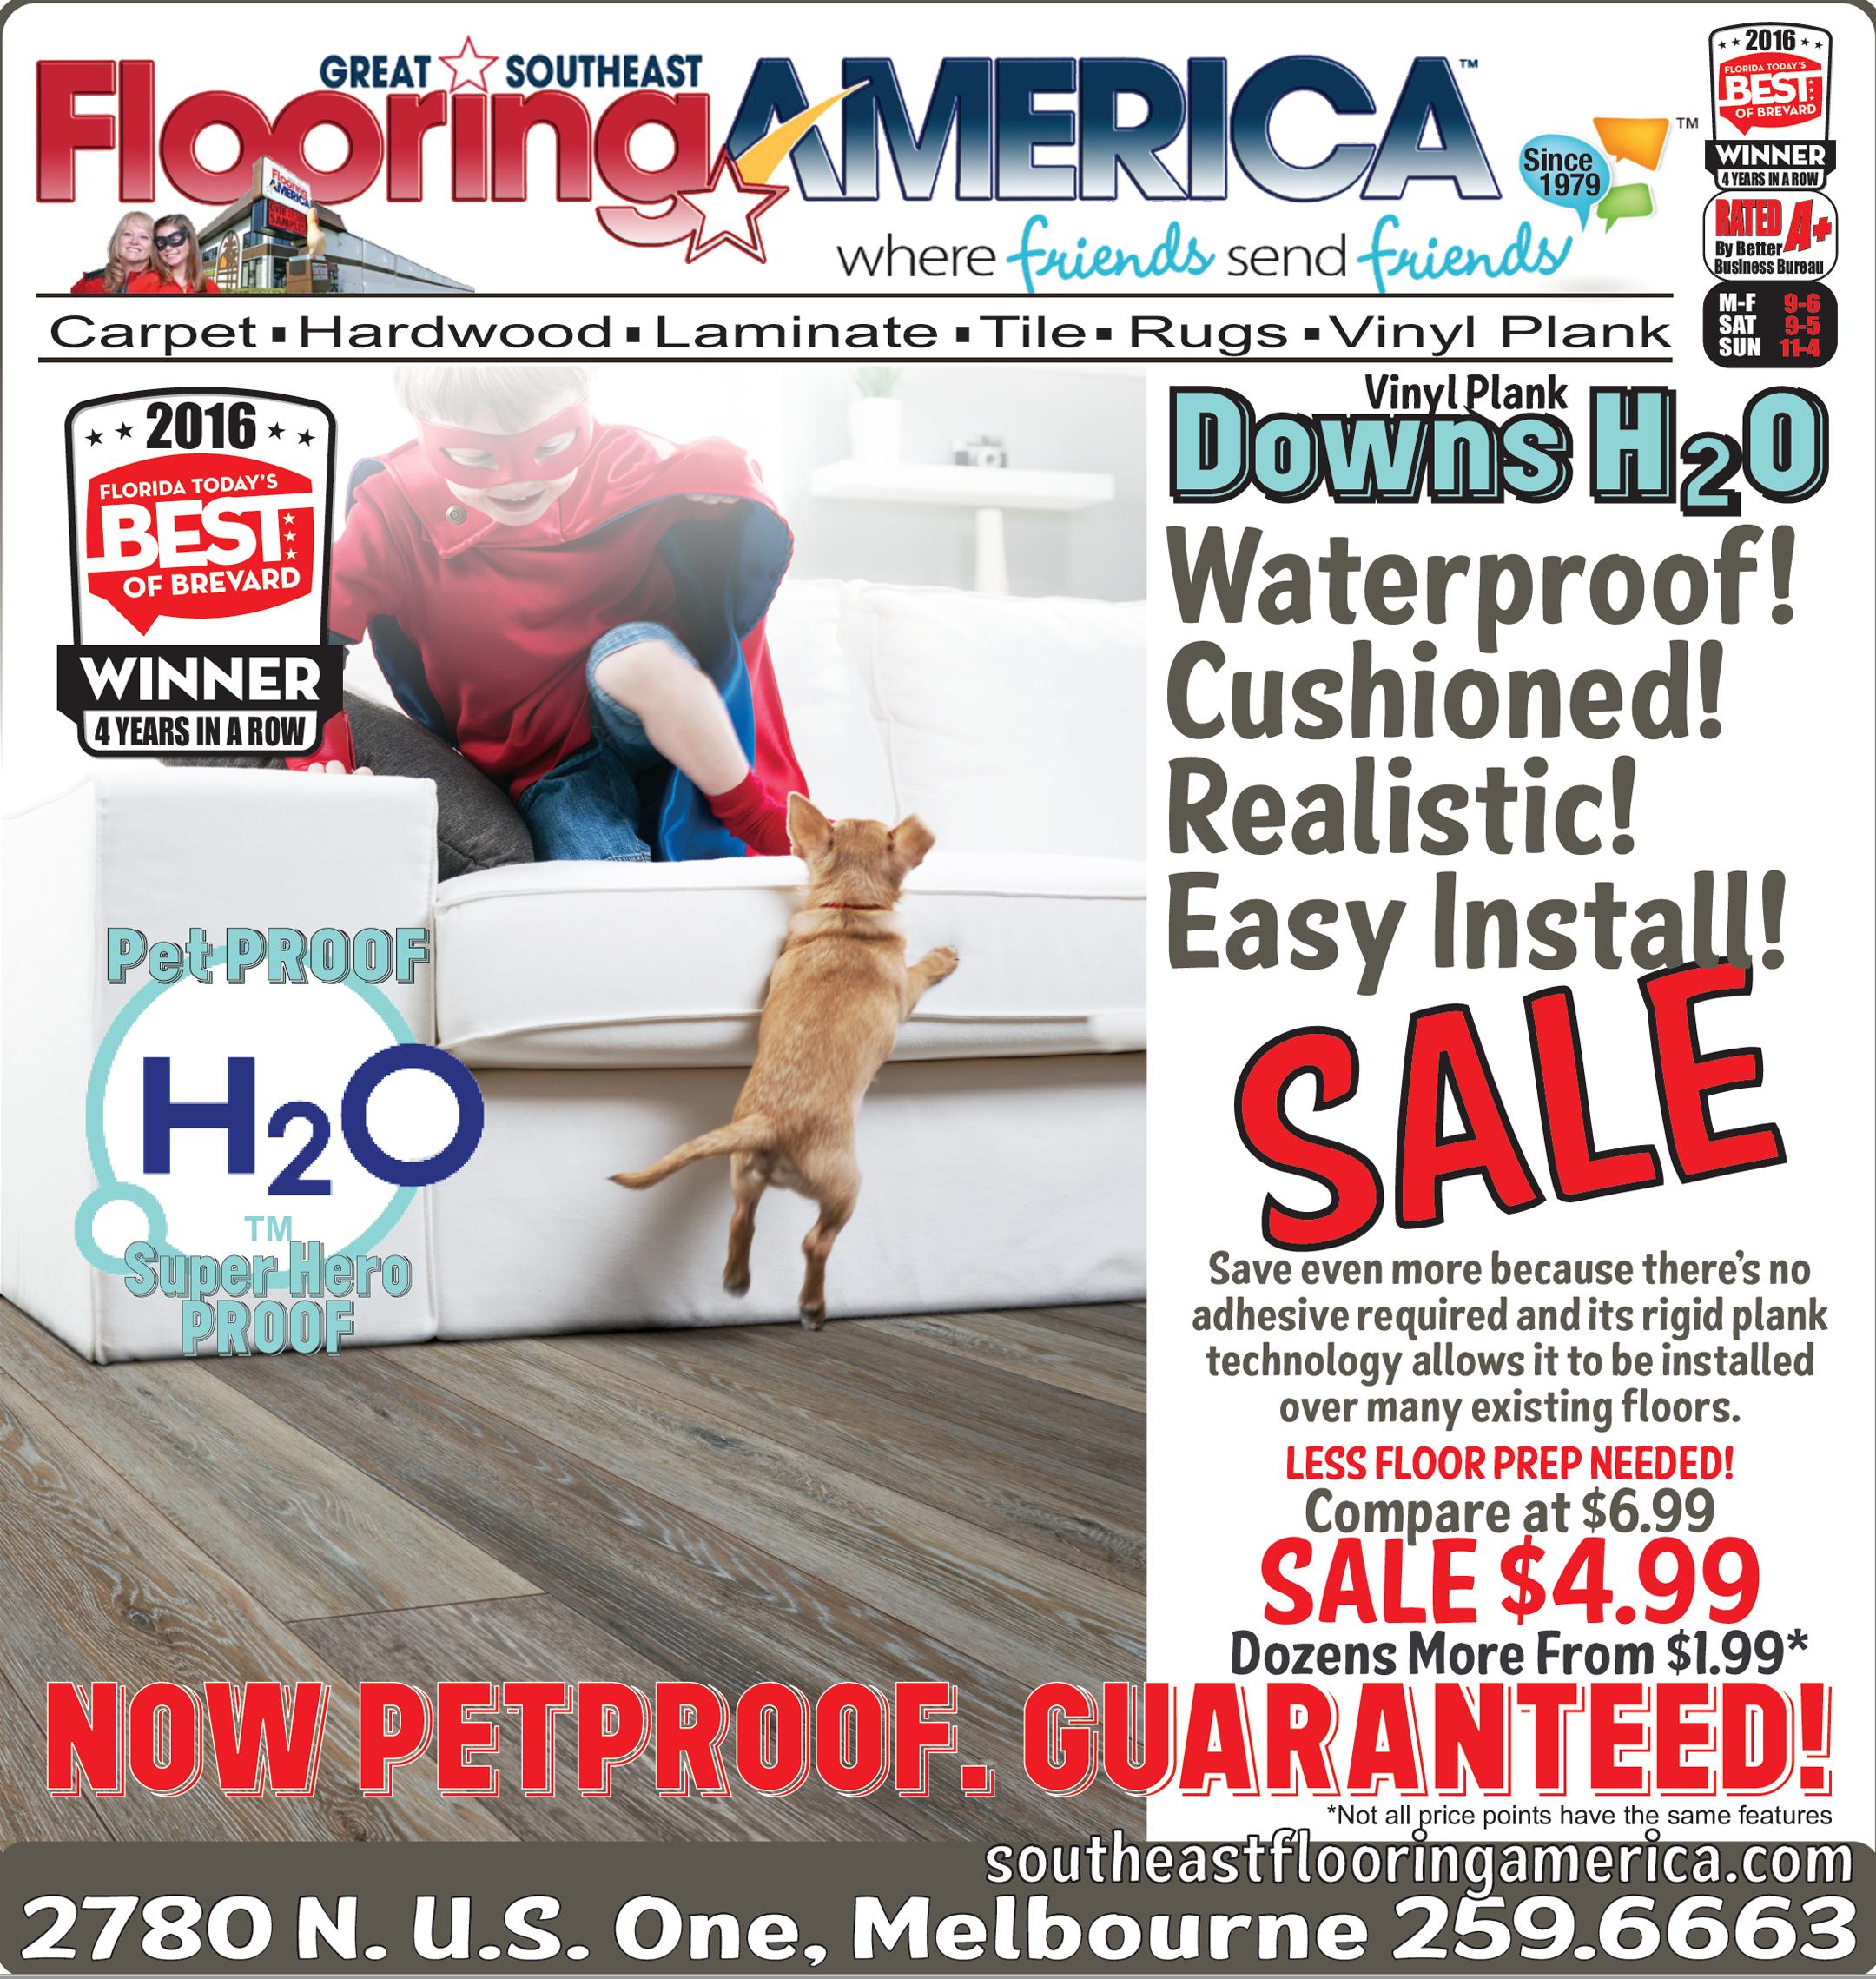 Great Southeast Flooring America®